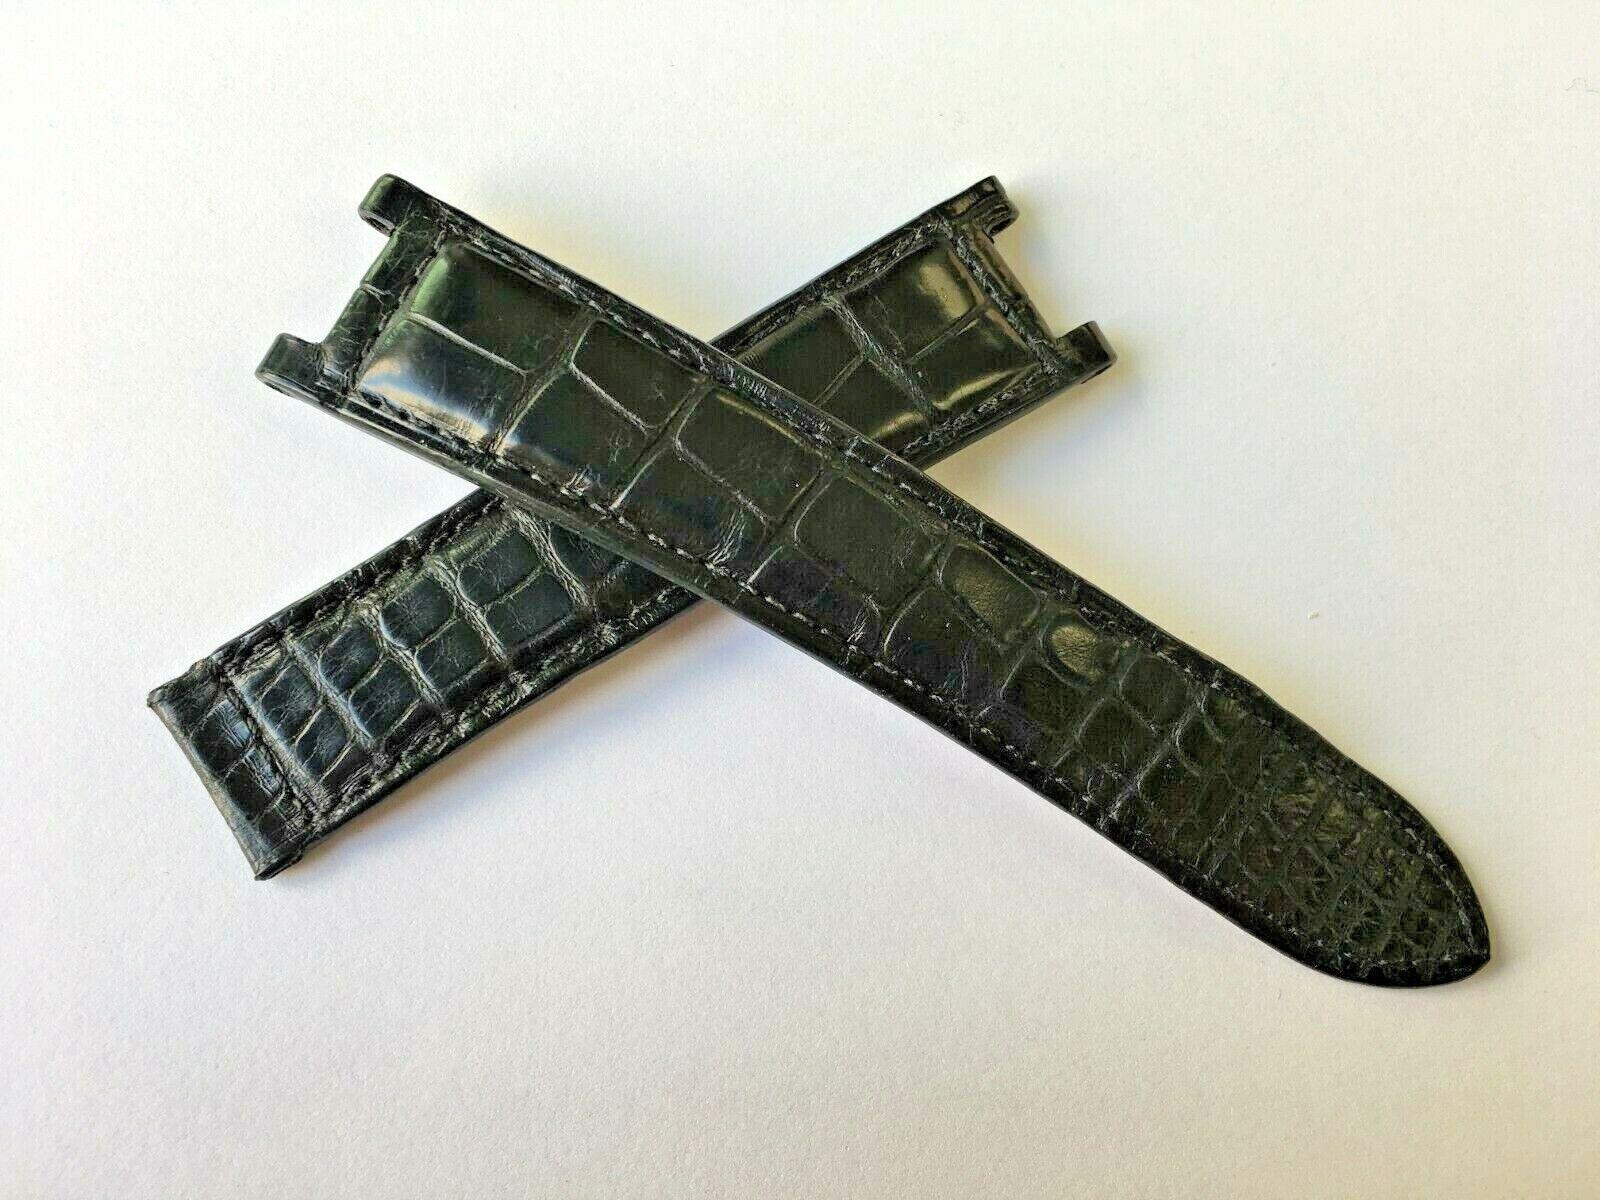 Cartier Pasha Uhrenarmband Alligator Matt Schwarz 20/18 mm